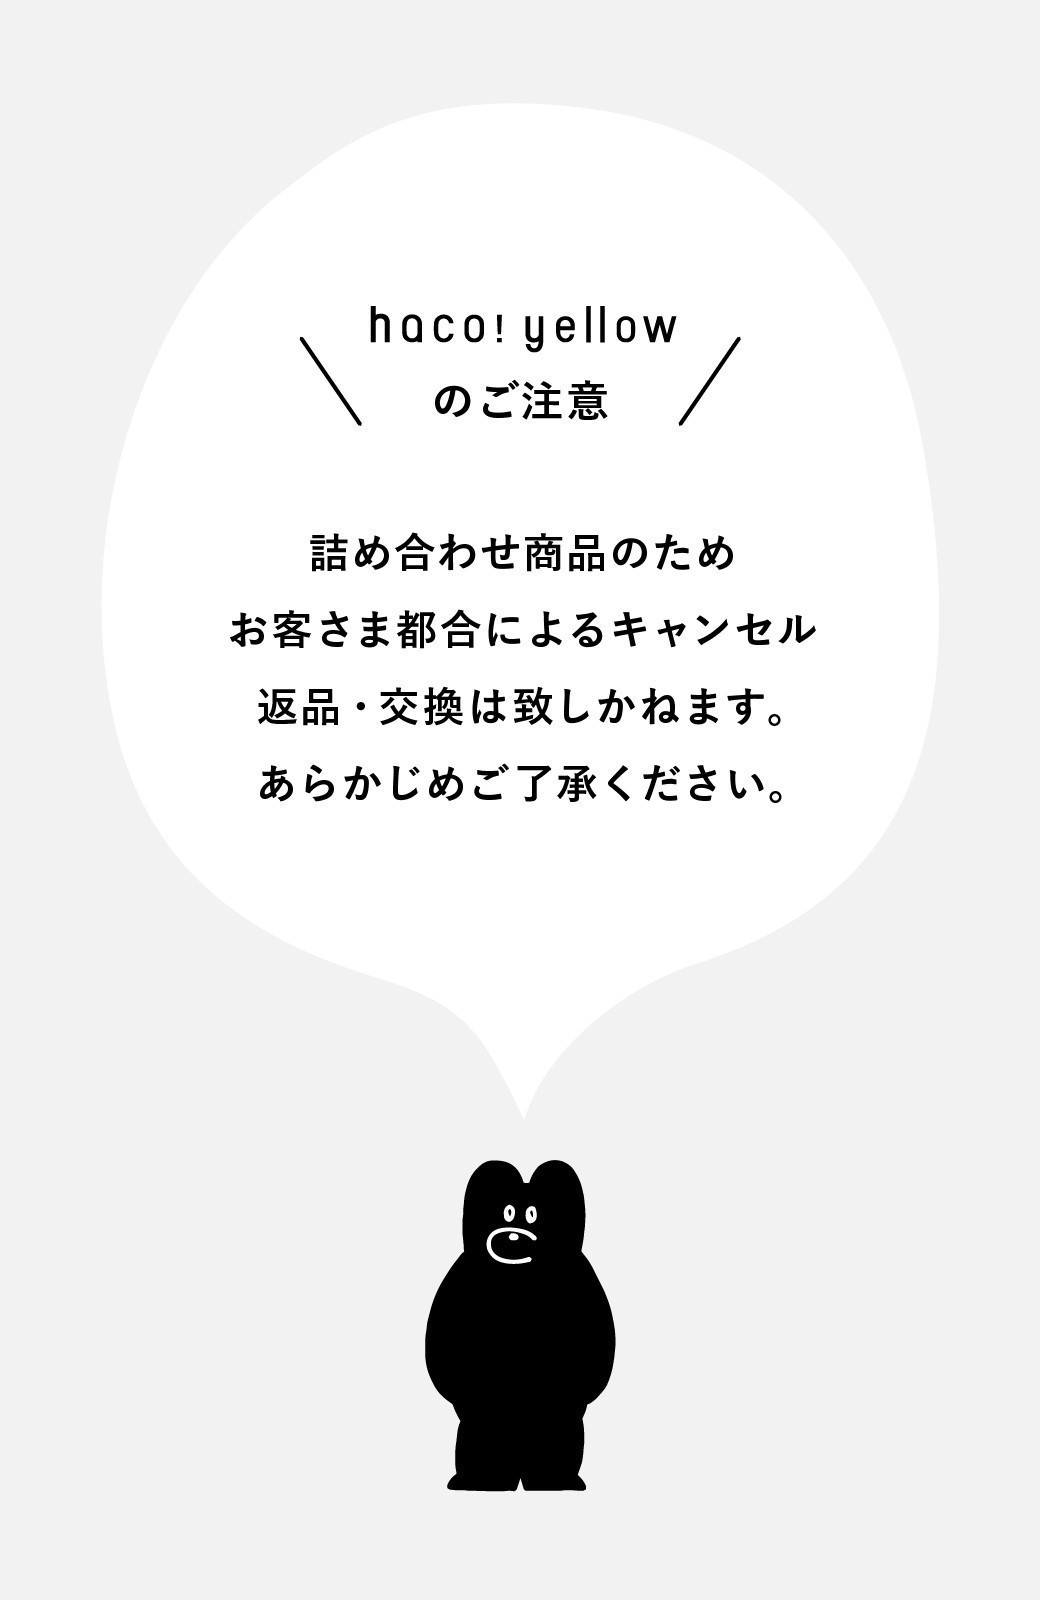 haco! 秋冬新作コート&ワンピース込み!新年大人かわいい計画邁進yellow <その他>の商品写真3